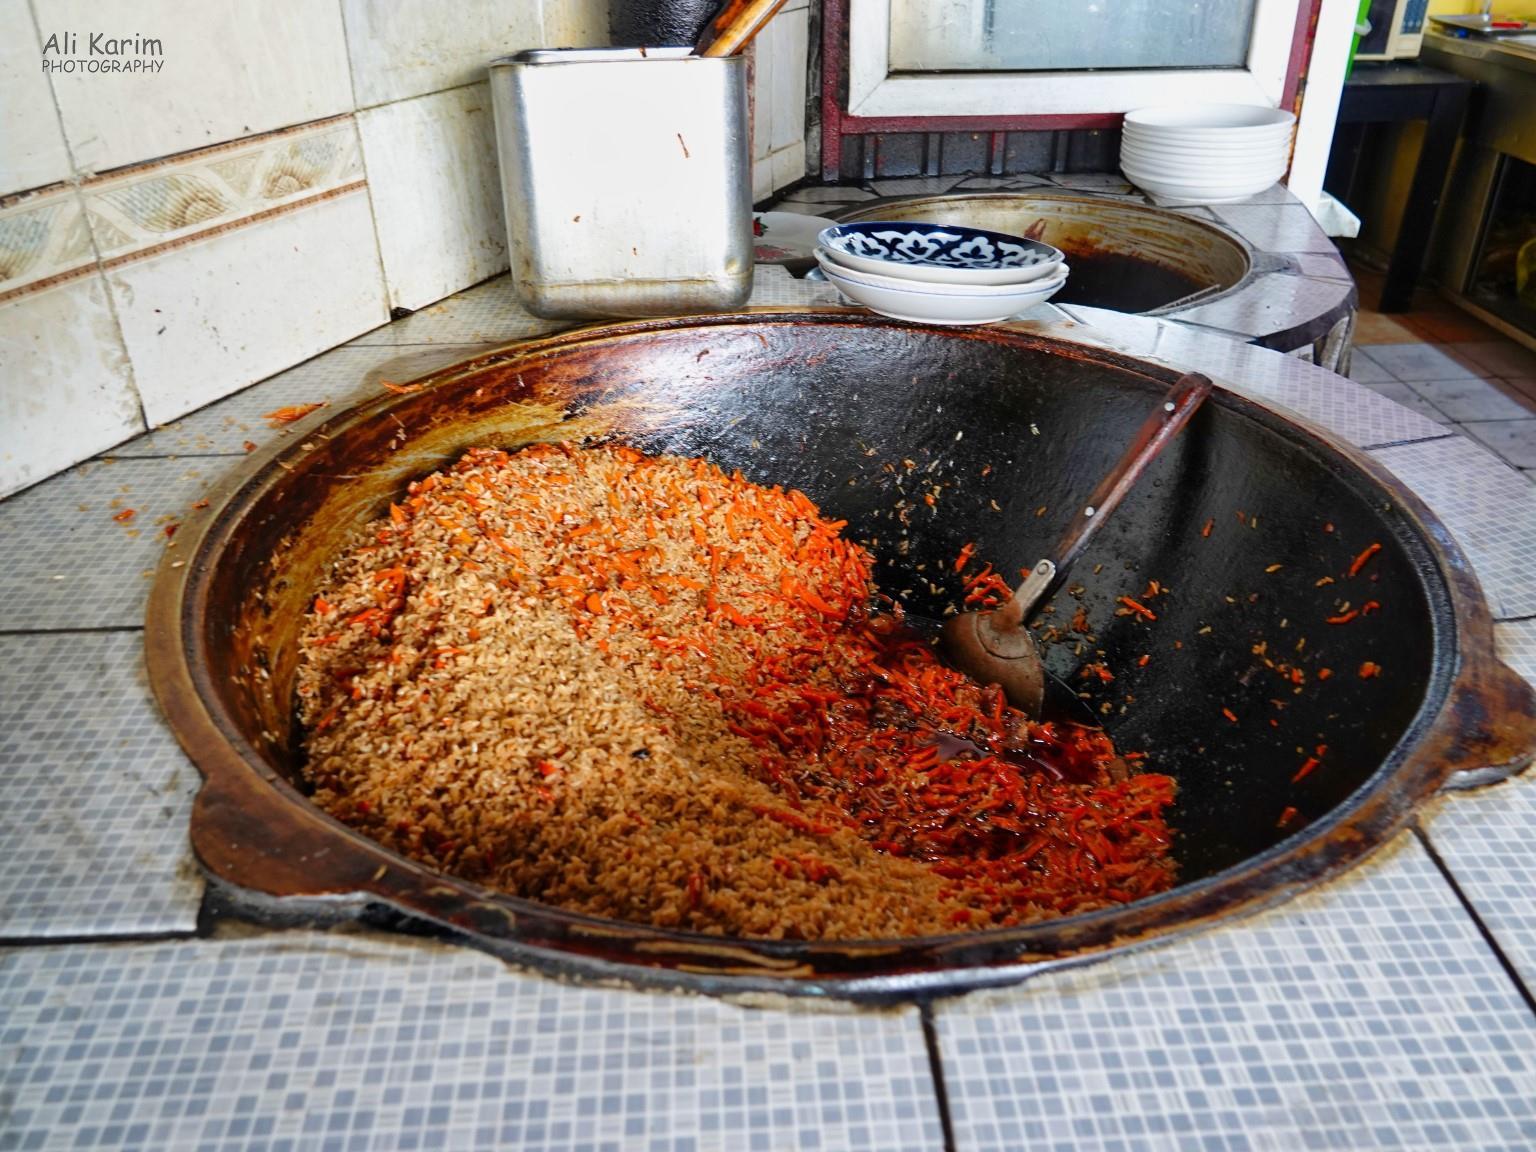 More Dushanbe, Tajikistan Plov, the national dish, was on sell in open air restaurants inside Korvon market